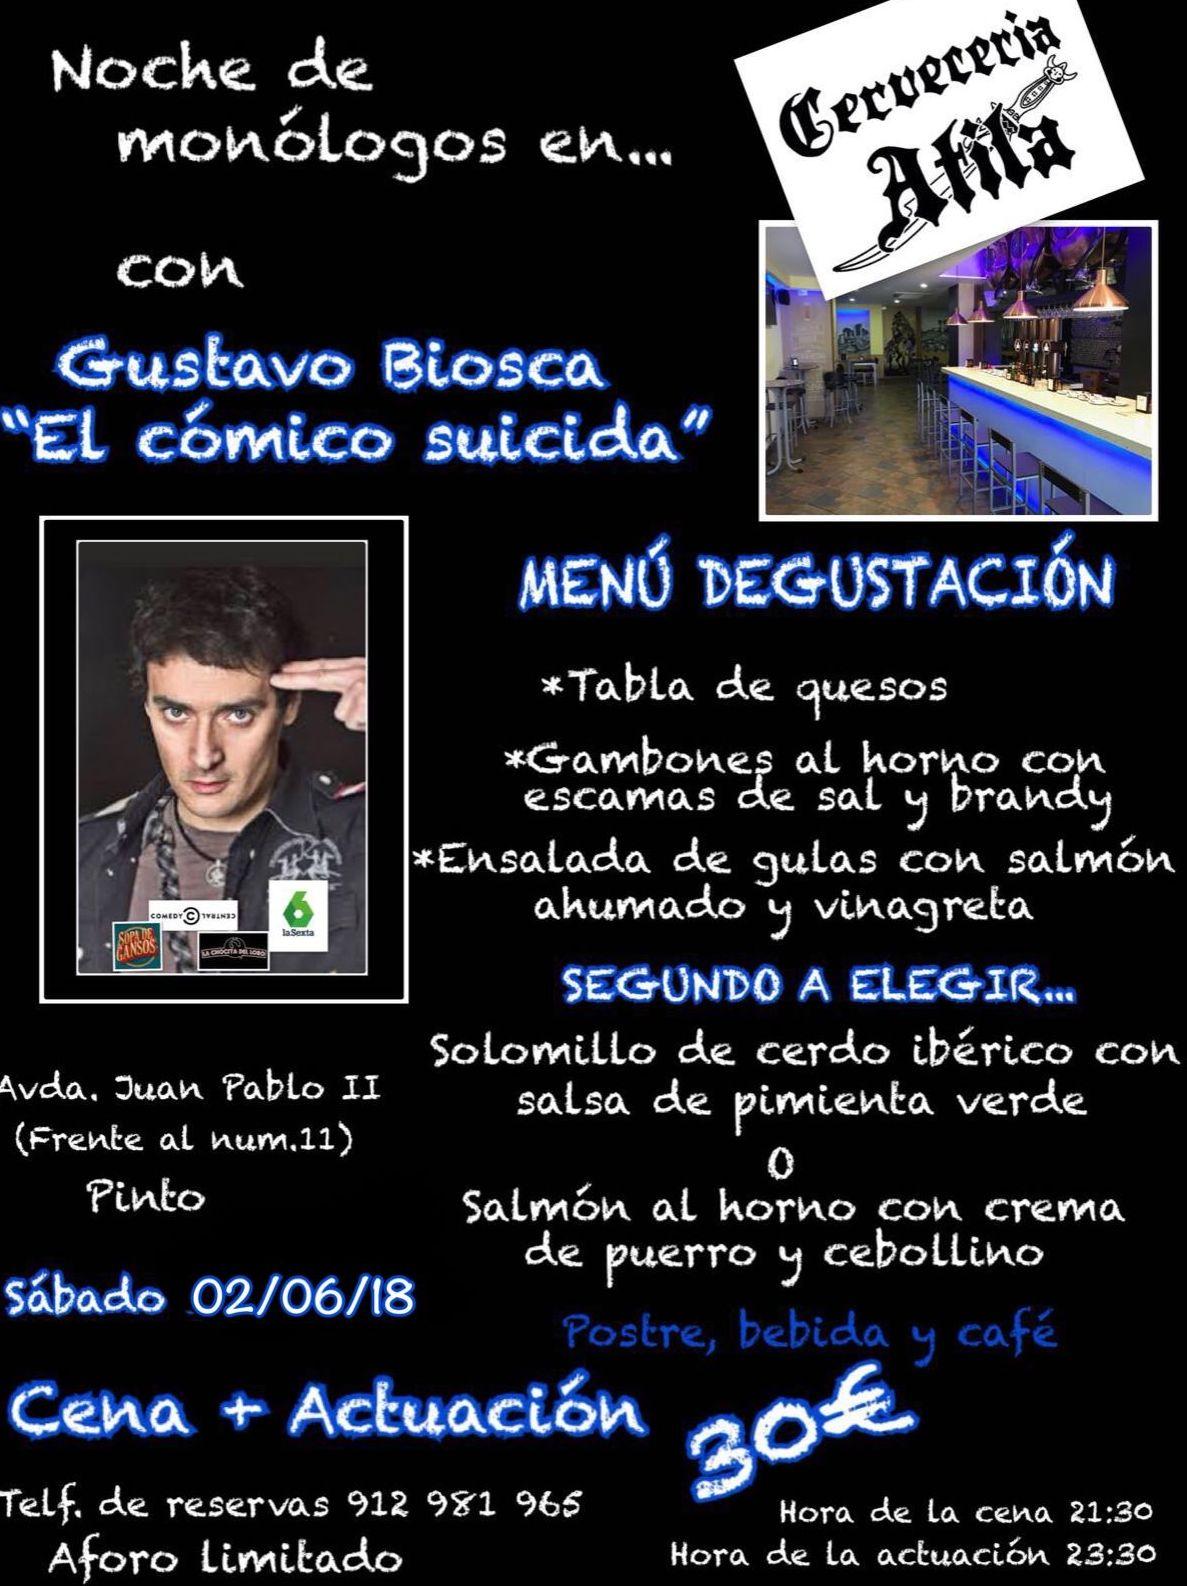 Gustavo Biosca.